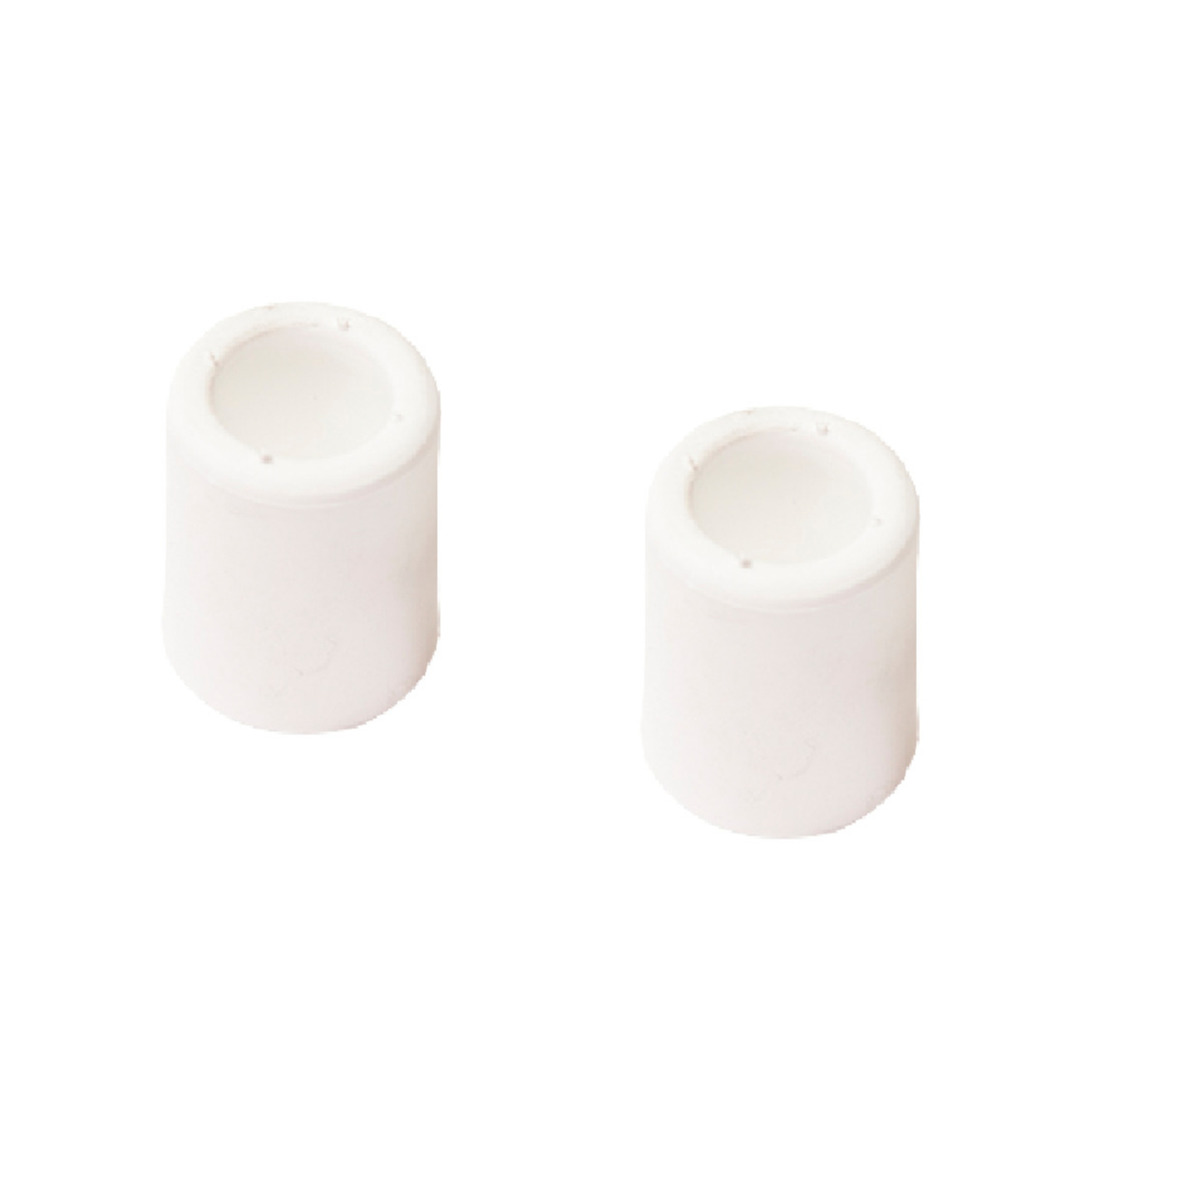 5x stuks deurstopper - deurbuffer rubber wit 35 mm